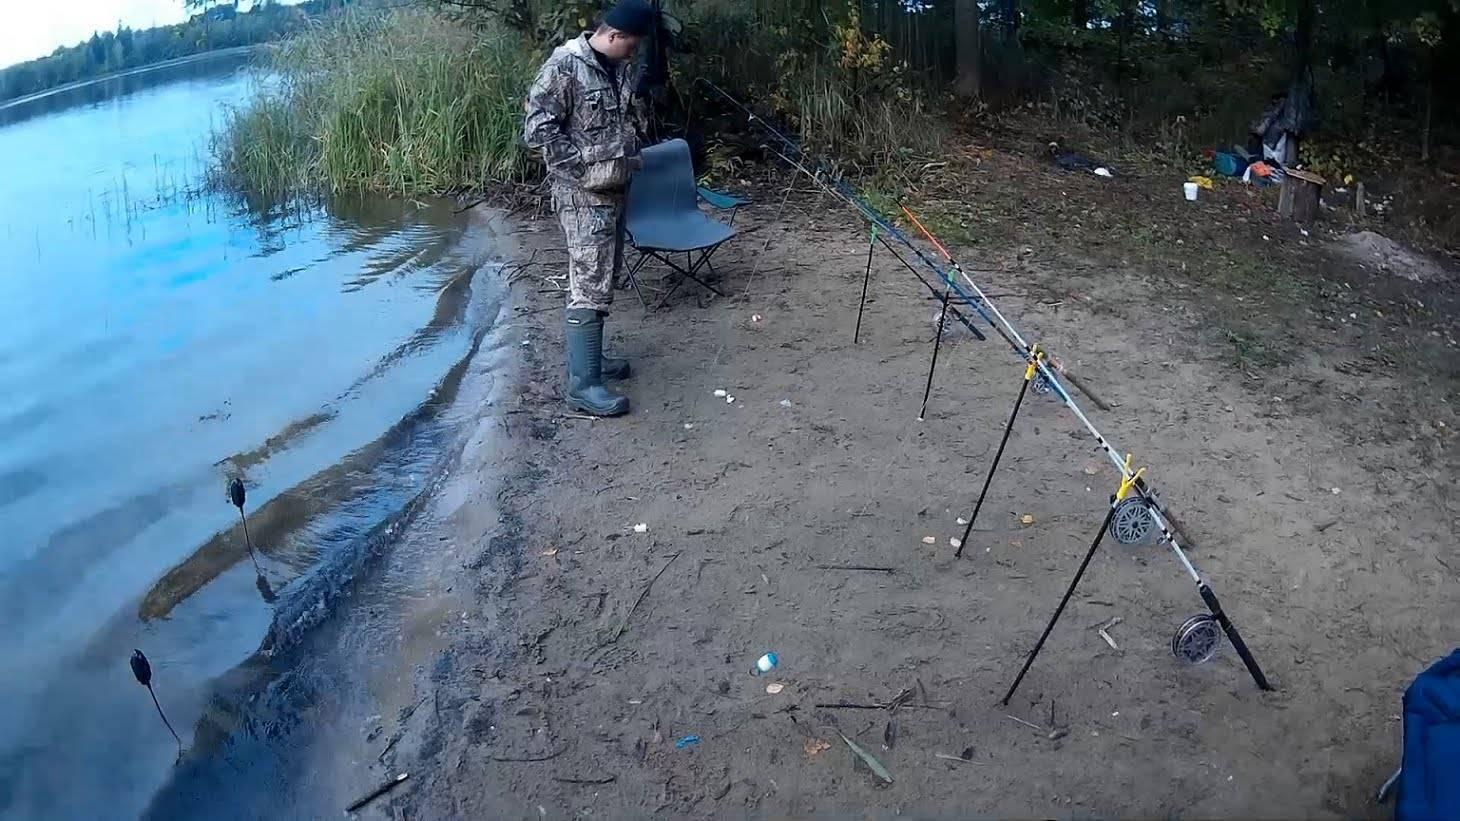 Снасти на леща для ловли с берега летом, оснастка и техника